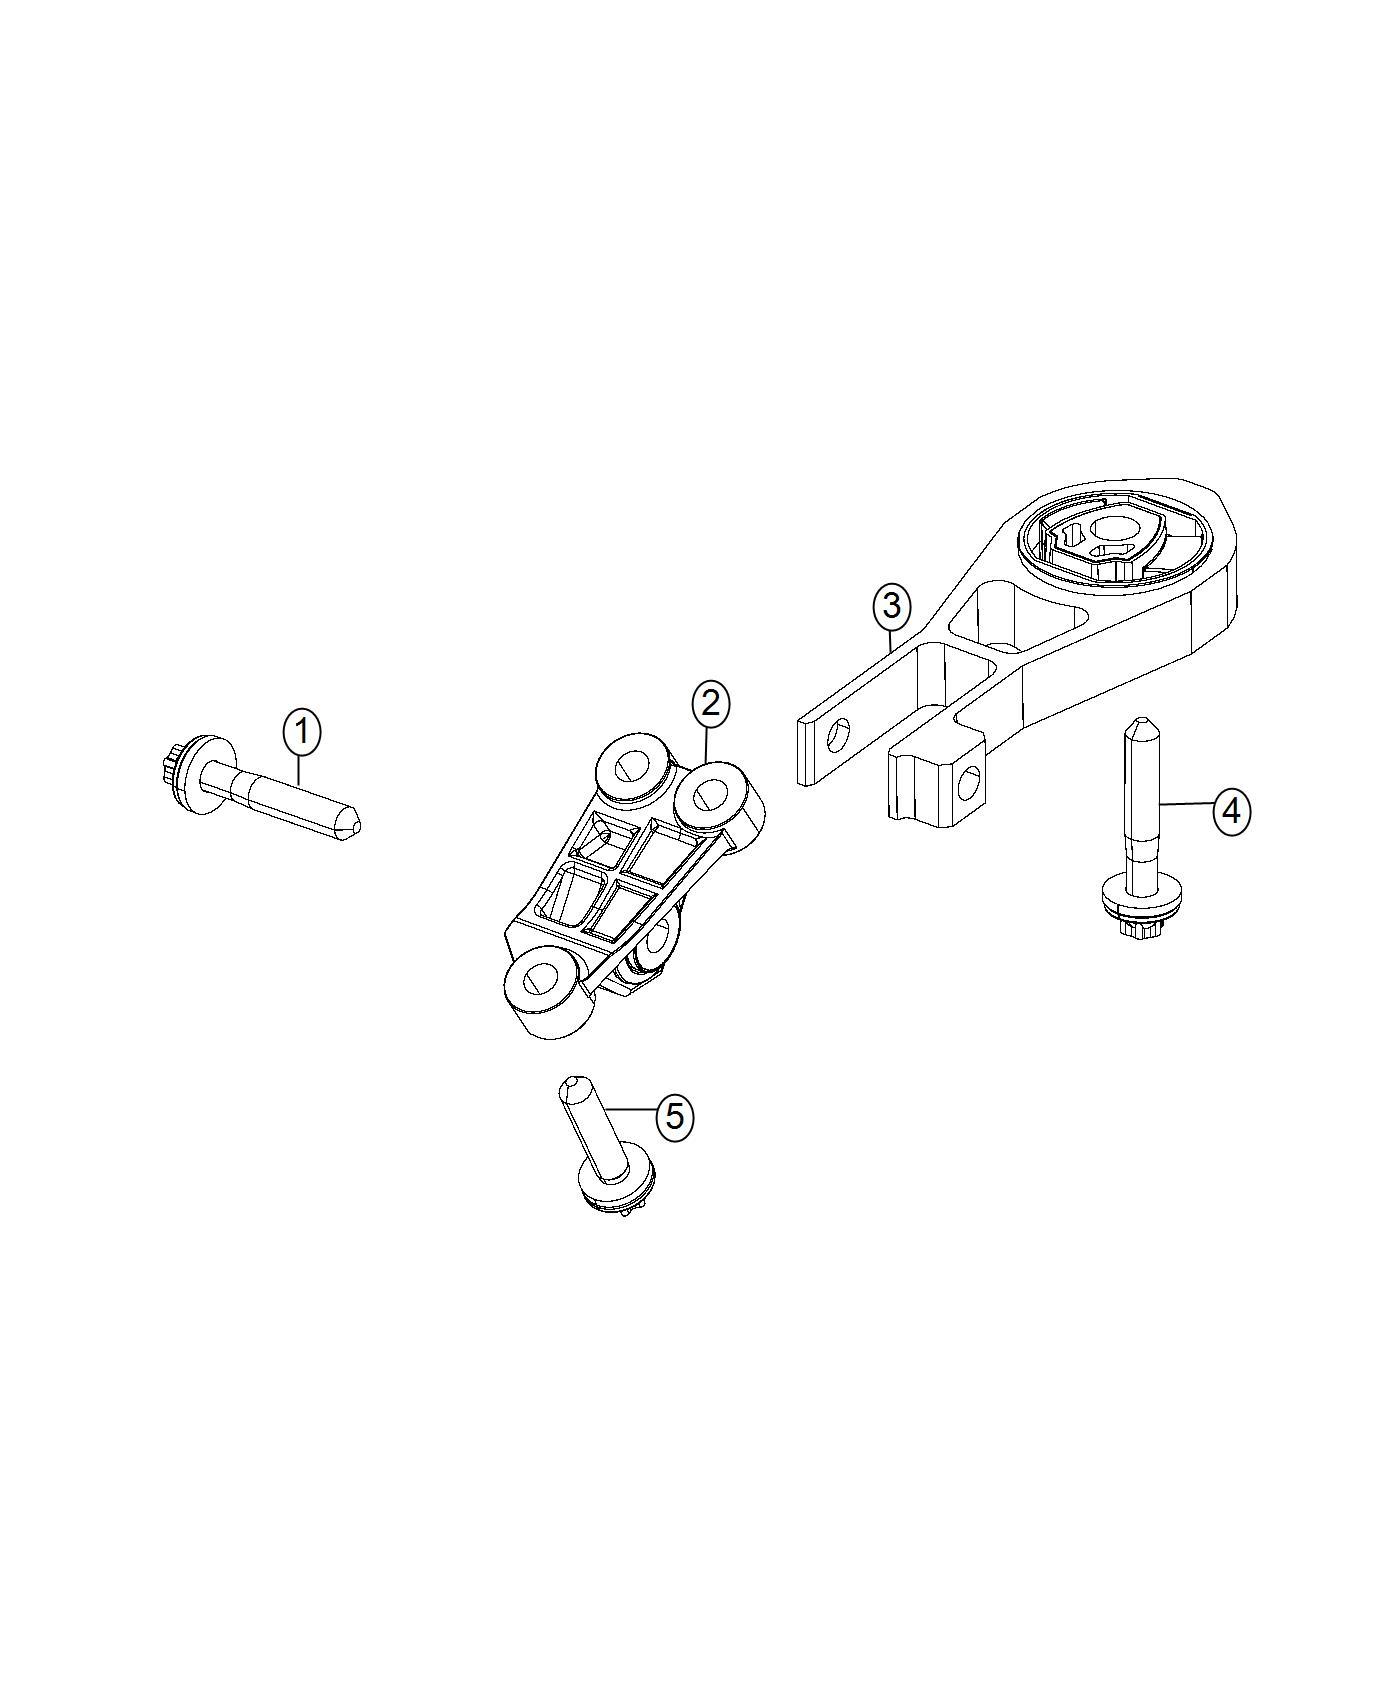 Jeep Compass Isolator. Transmission mount. Awd, auto, fwd